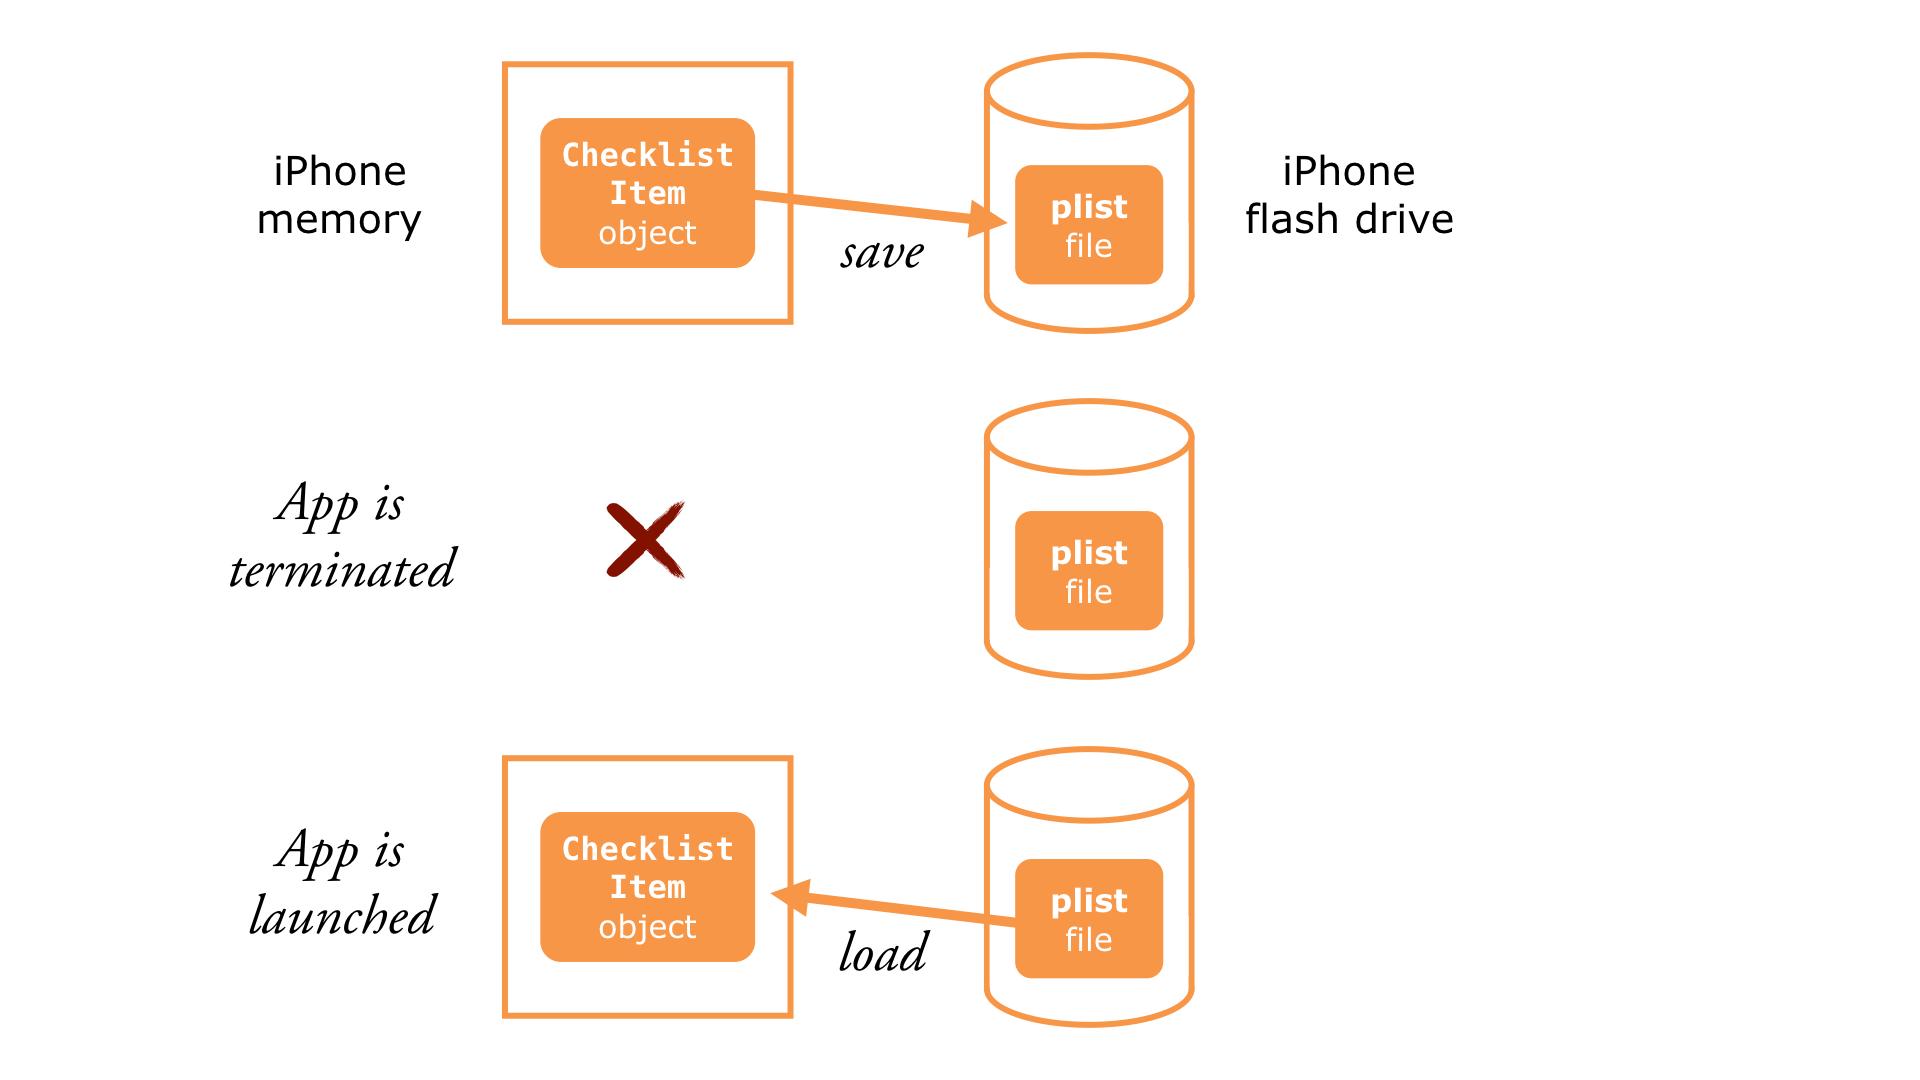 The process of freezing (saving) and unfreezing (loading) objects